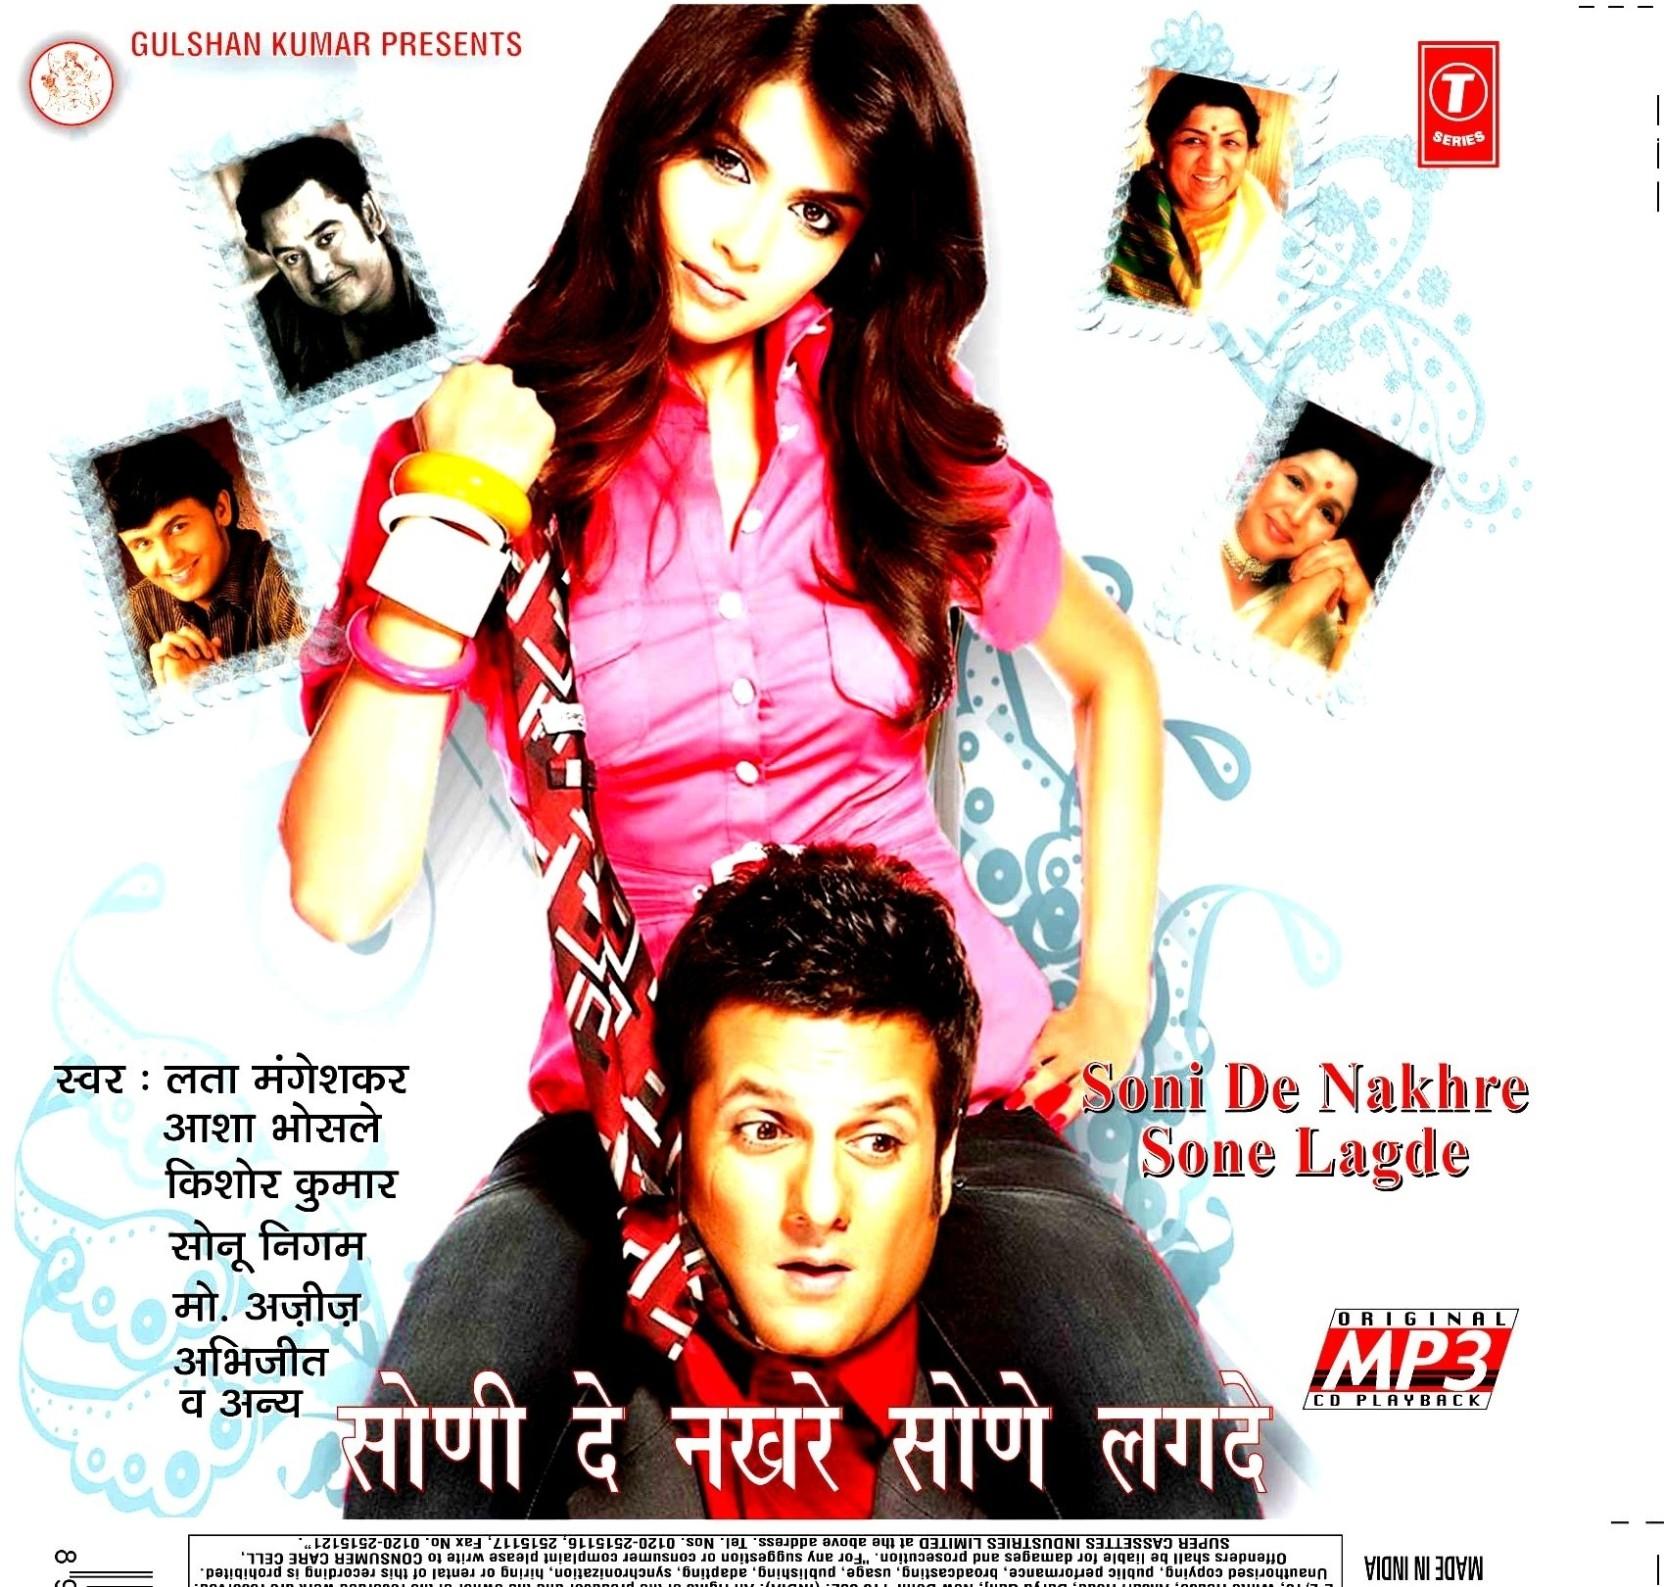 Soni de nakhre mp3 song download